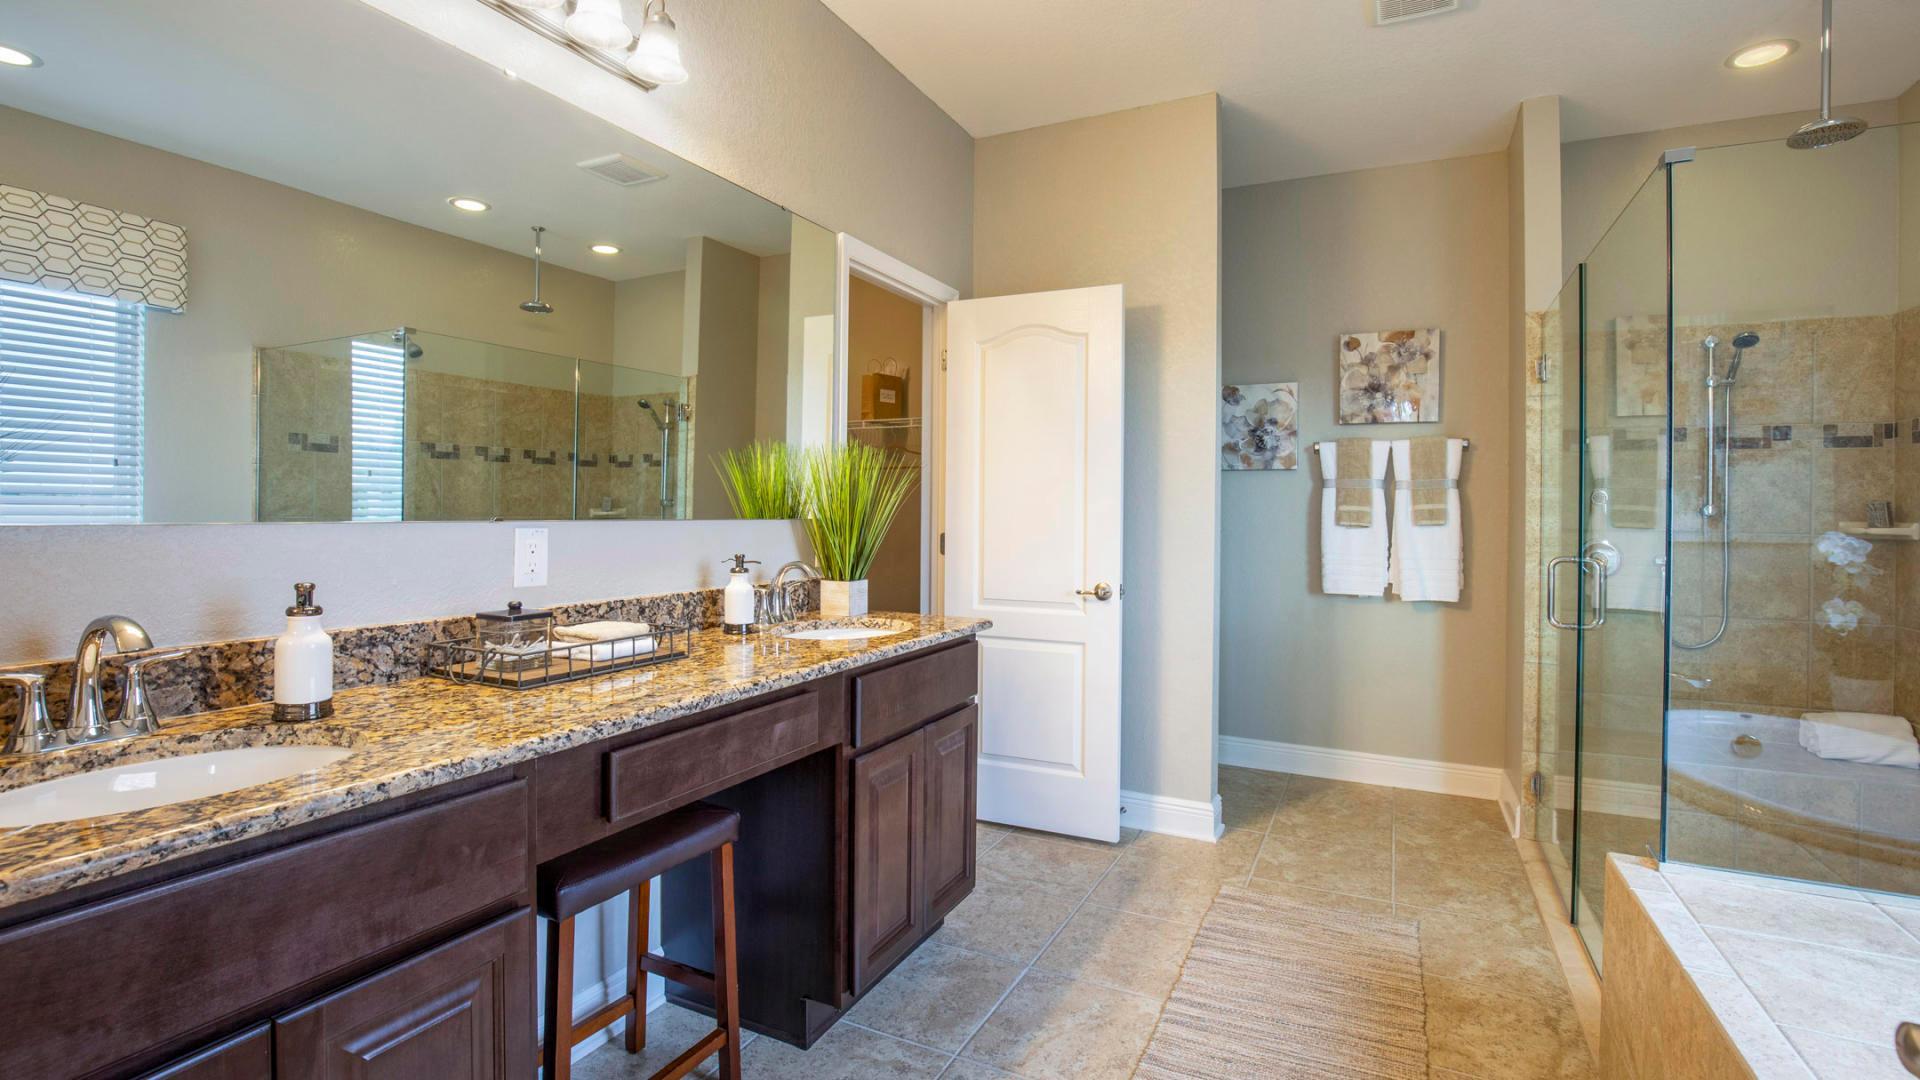 Bathroom featured in the Venice By Maronda Homes in Daytona Beach, FL